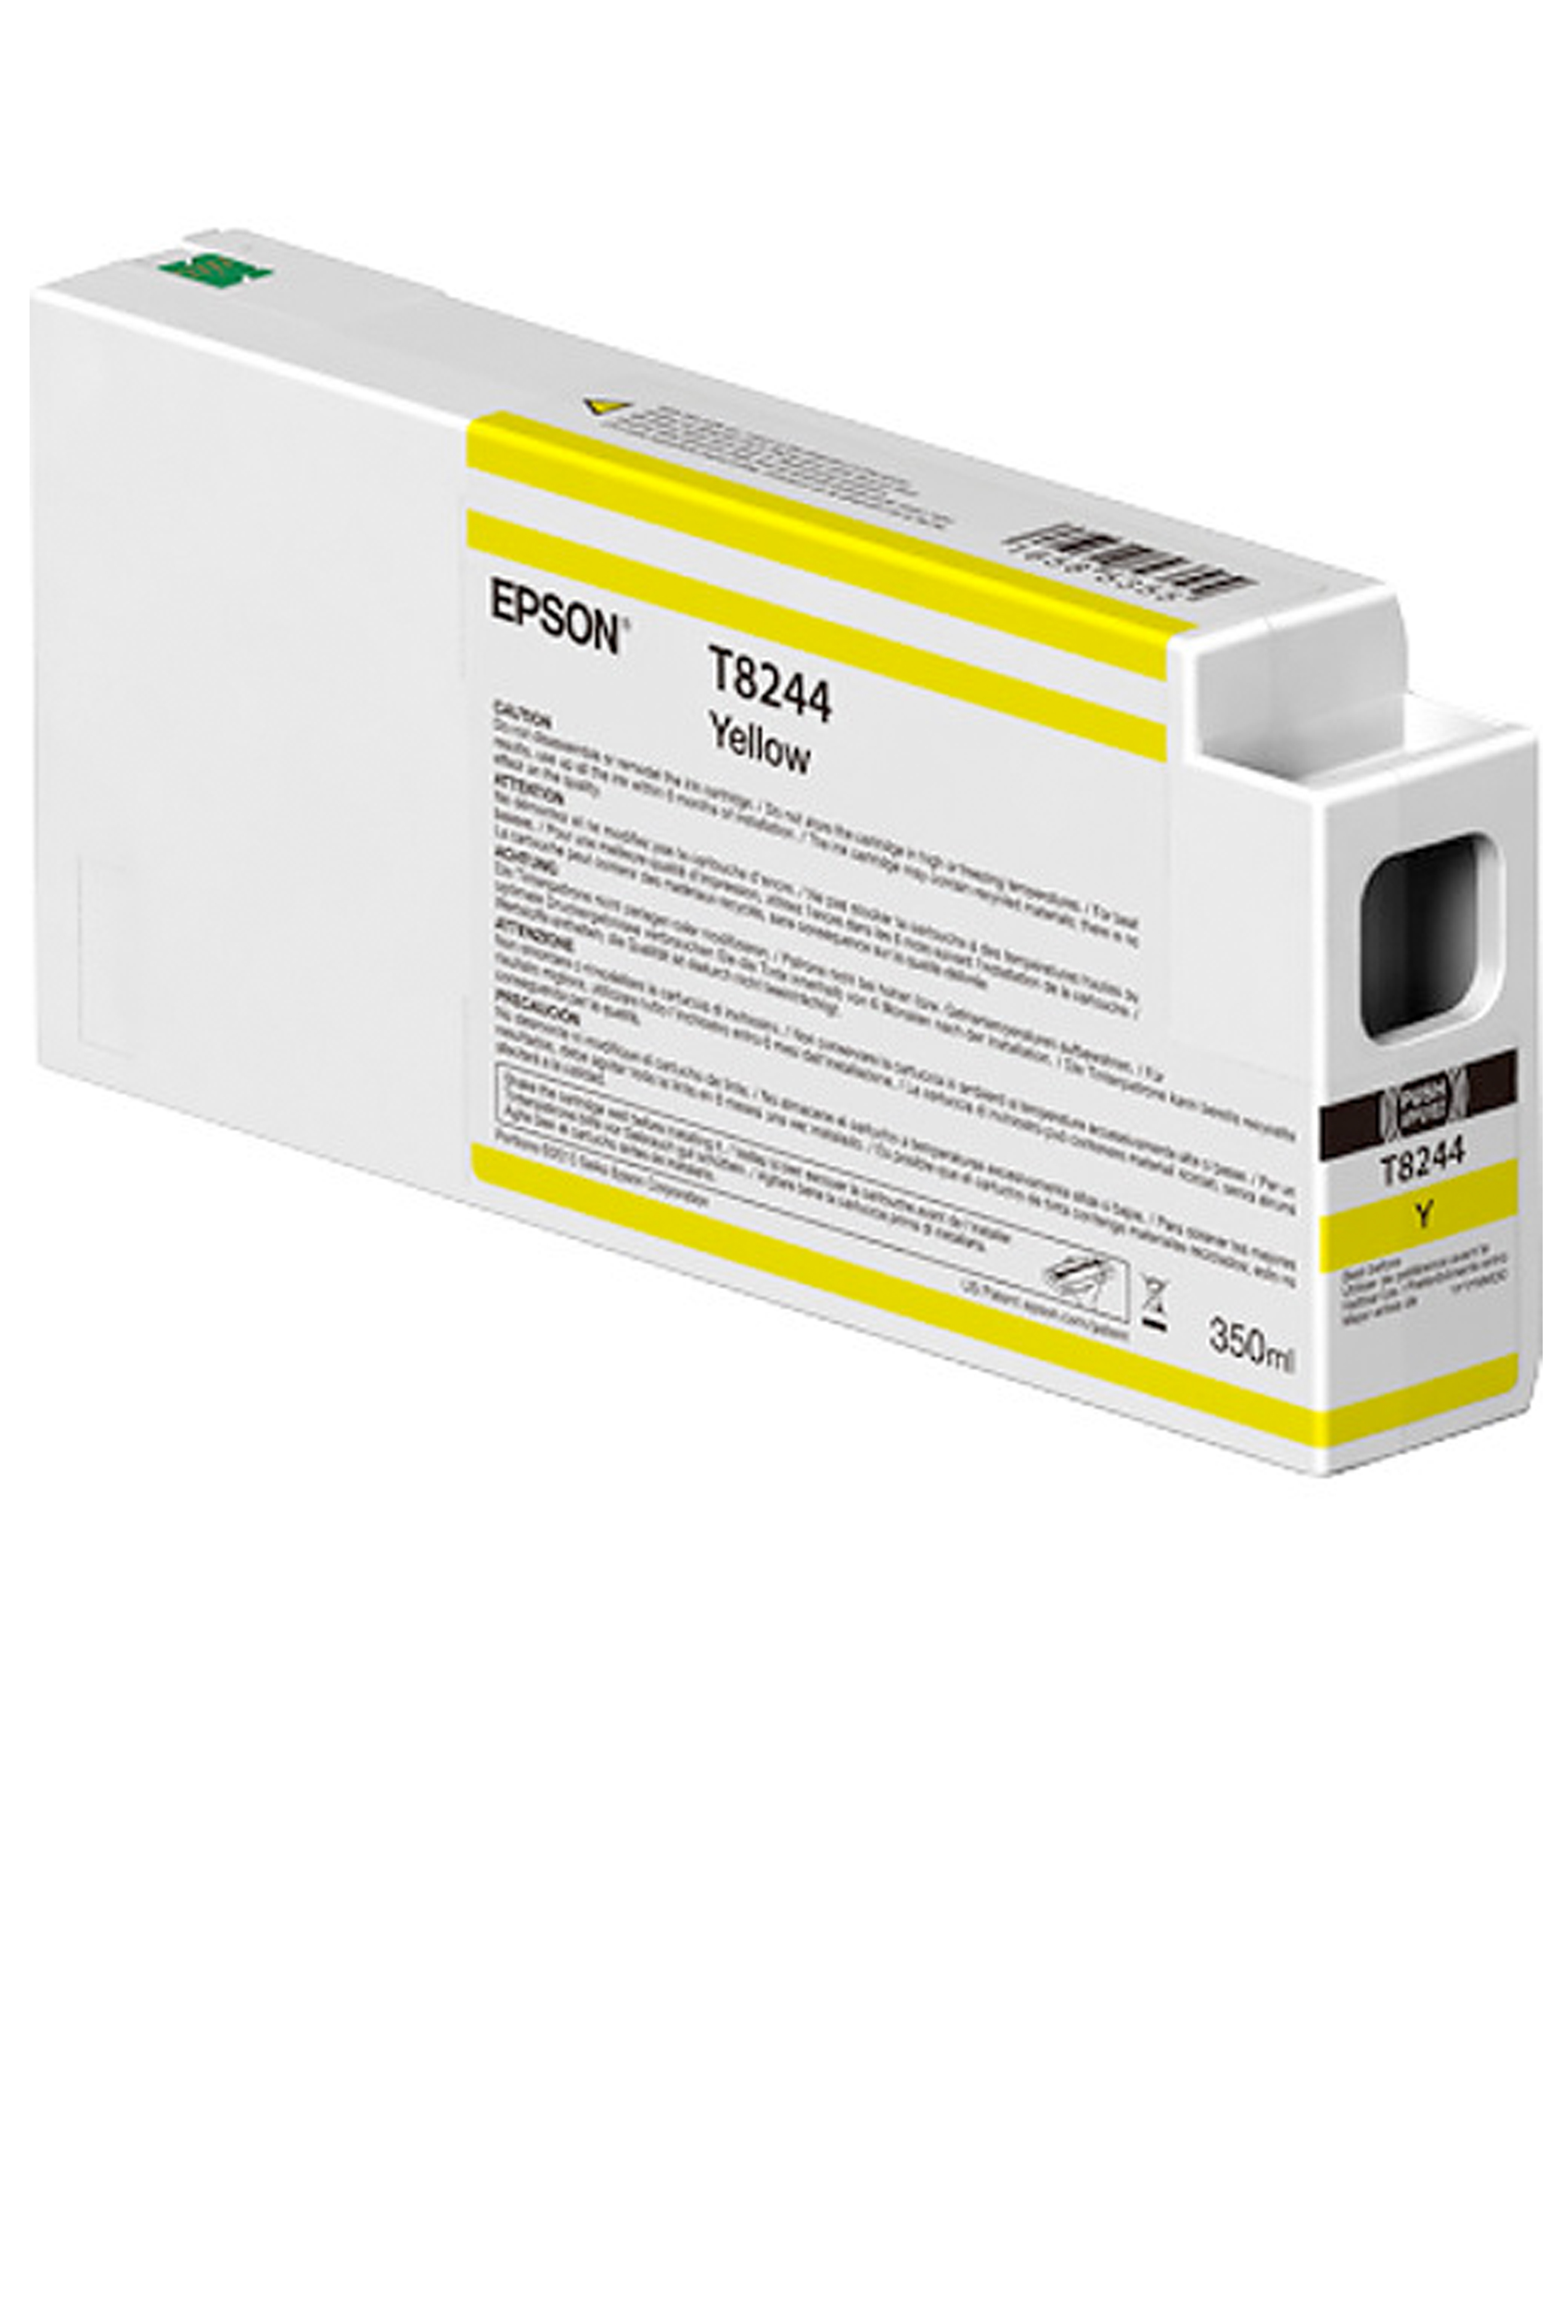 Epson EPSON HI YELLOW INK (350 ML) (T824400)